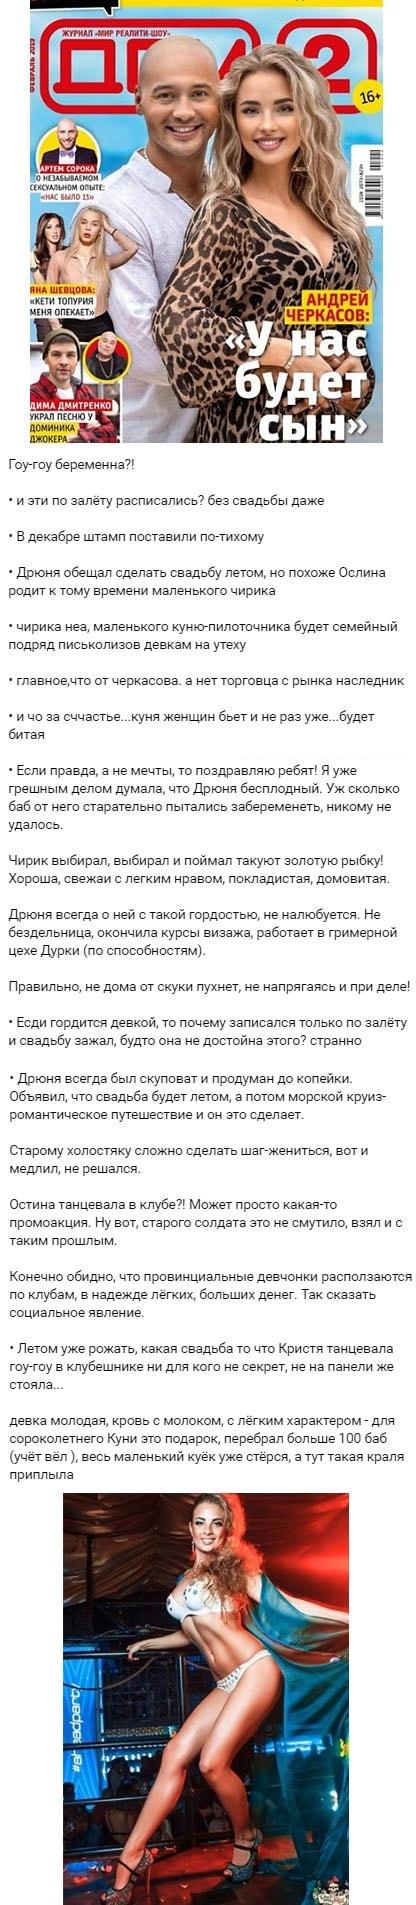 Андрей Черкасов скоро станет отцом